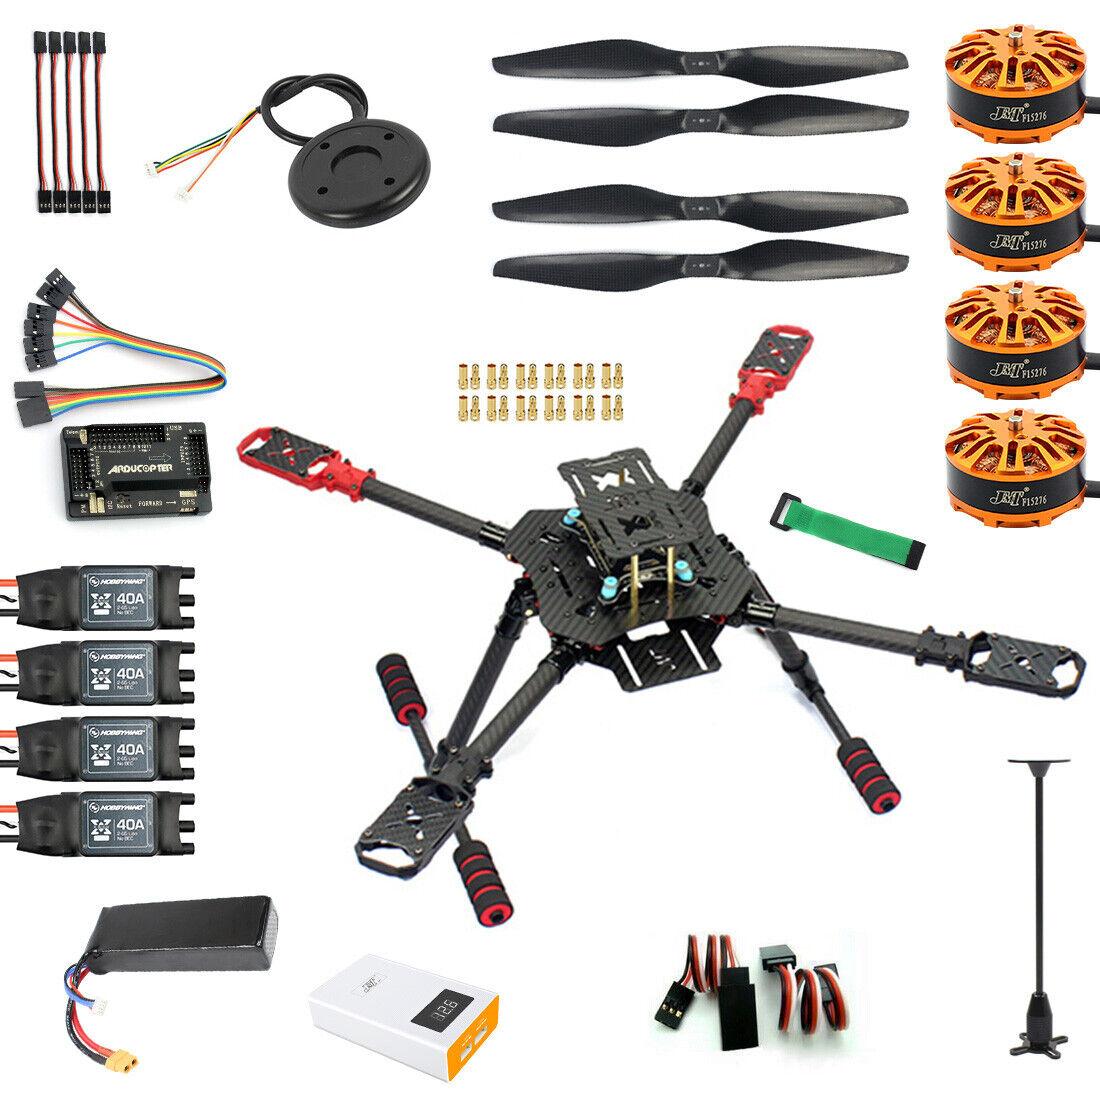 Hágalo usted mismo RC GPS DRONE Umbrella Foldable X4 560mm FPV Avión 4-Axis Kit desensamblar